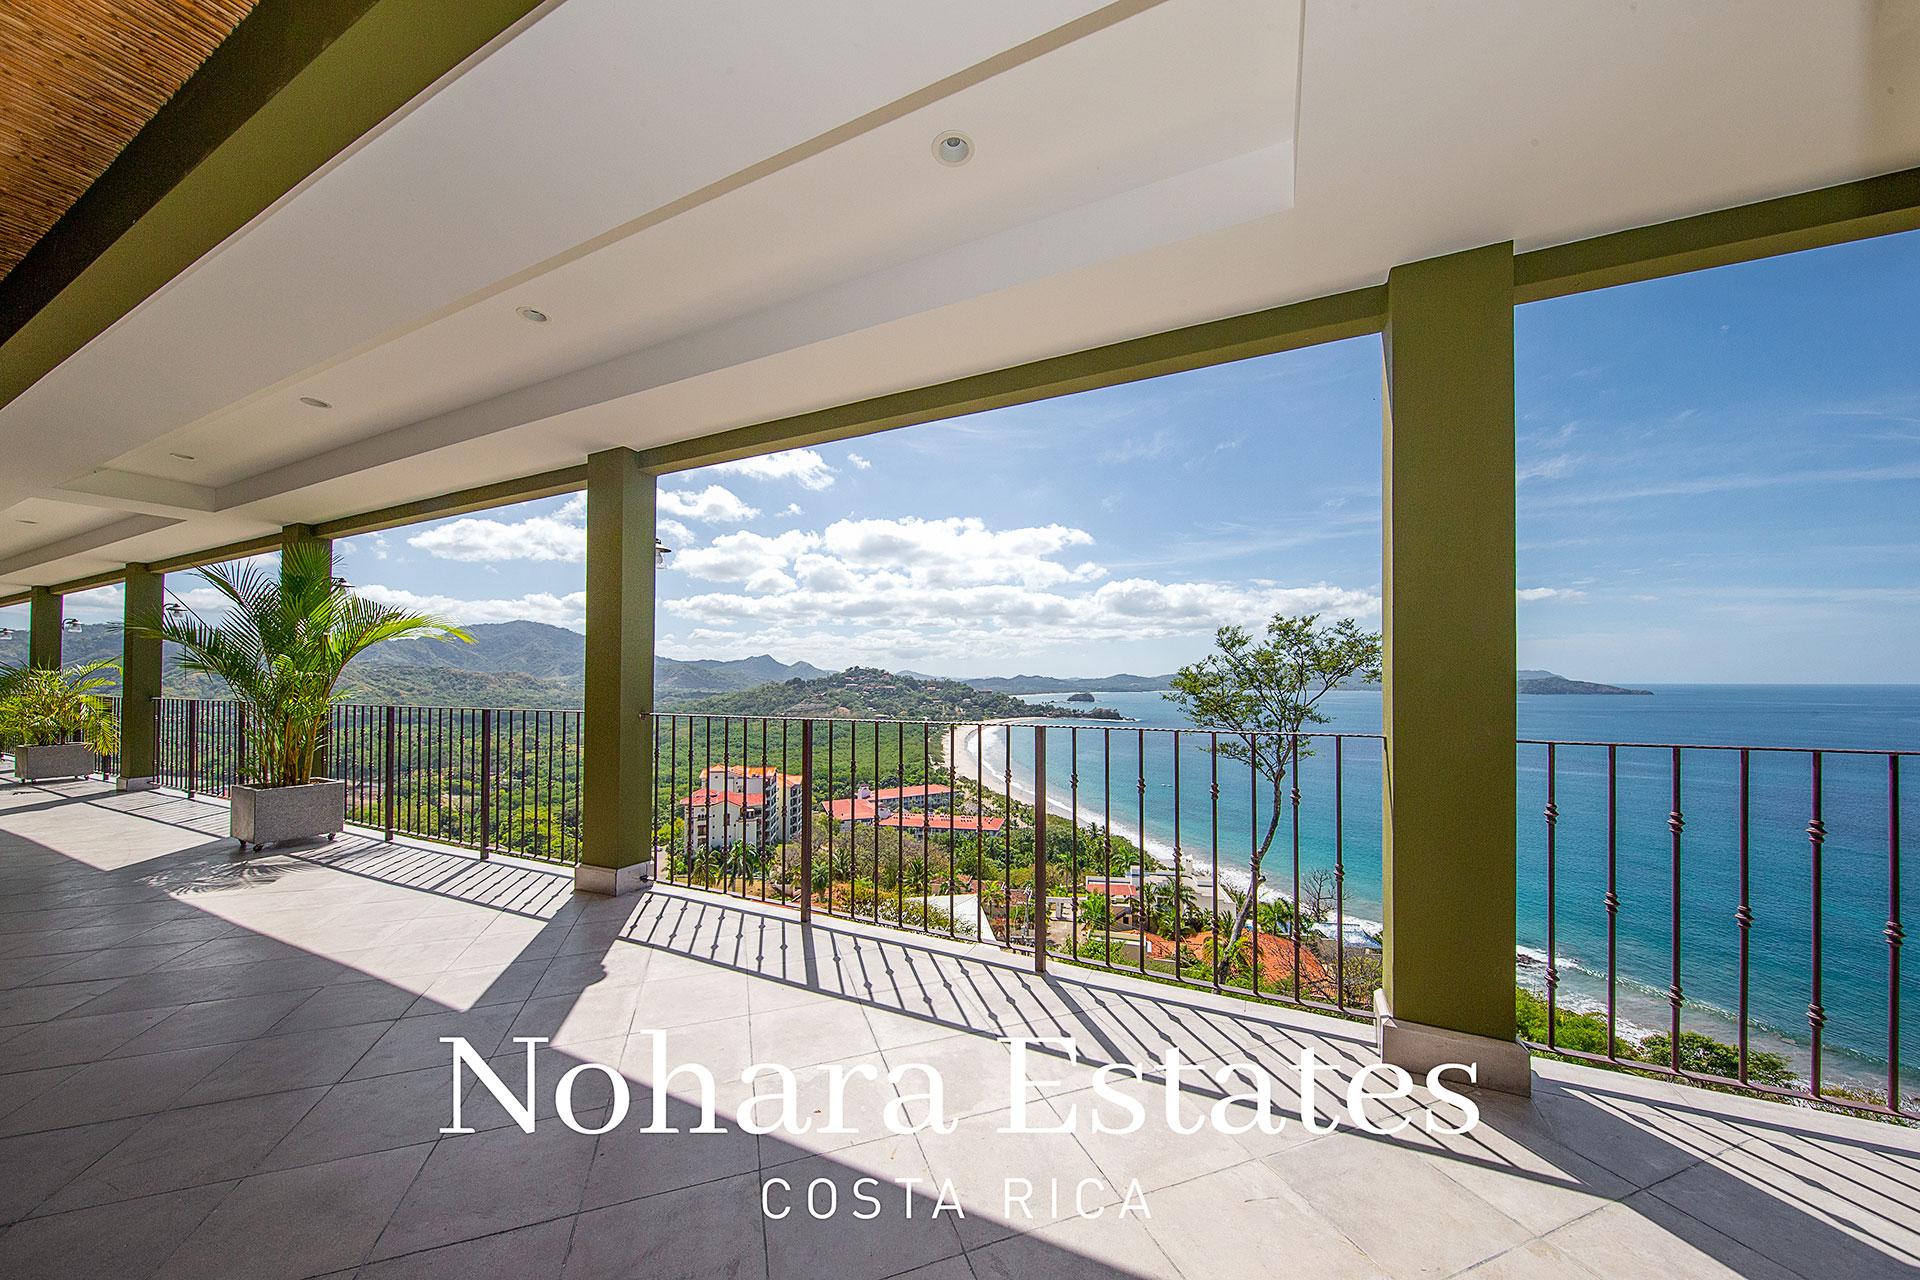 Nohara Estates Costa Rica 360 Esplendor Del Pacifico 3